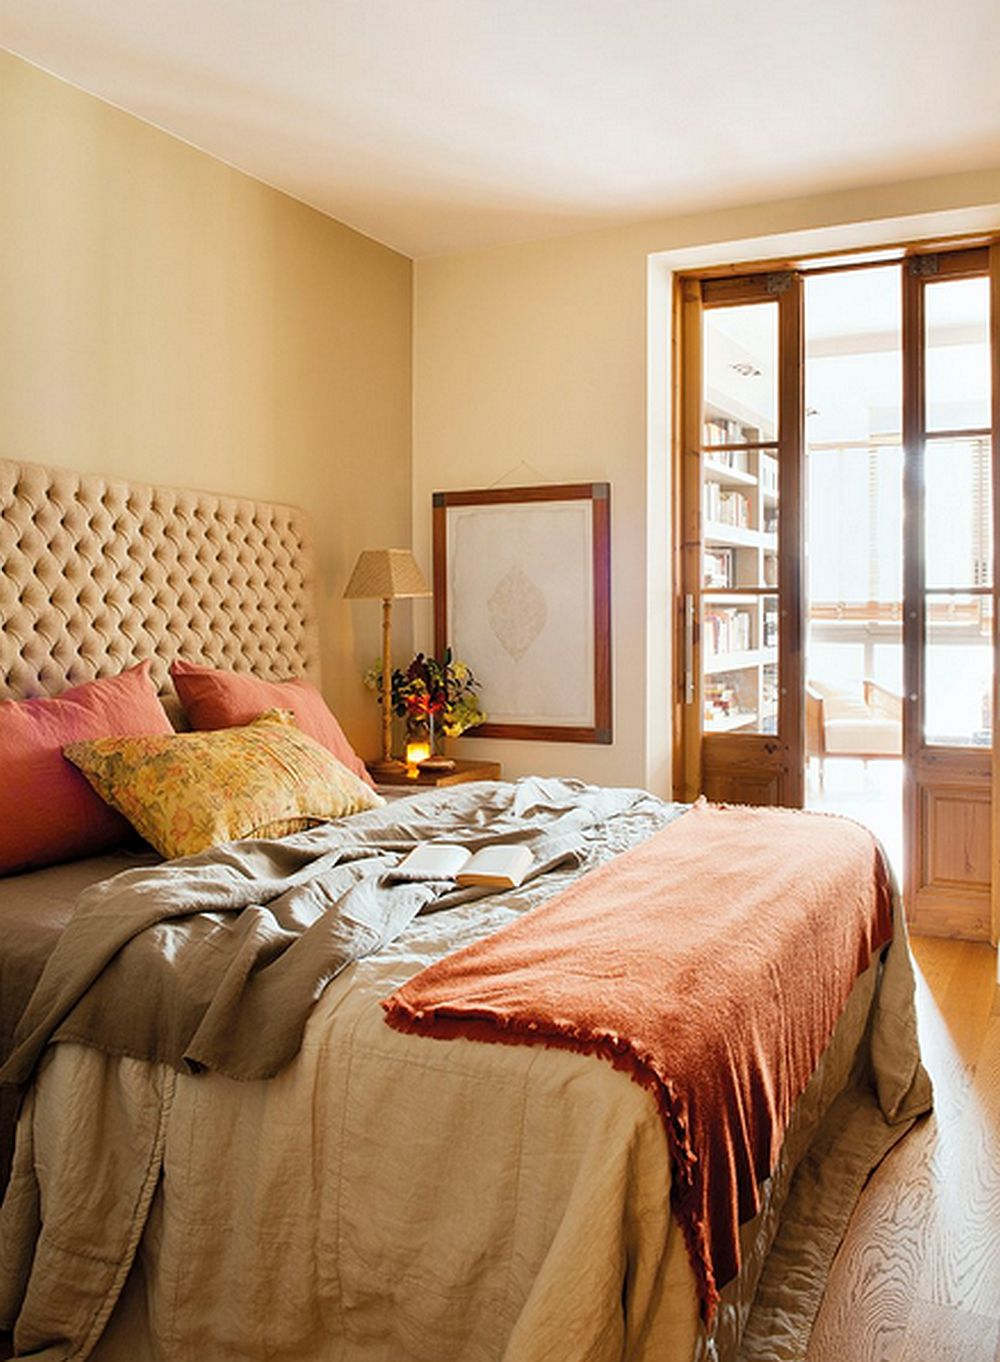 adelaparvu.com despre rustic si modern intr-o casa de la oras Foto ElMueble (12)